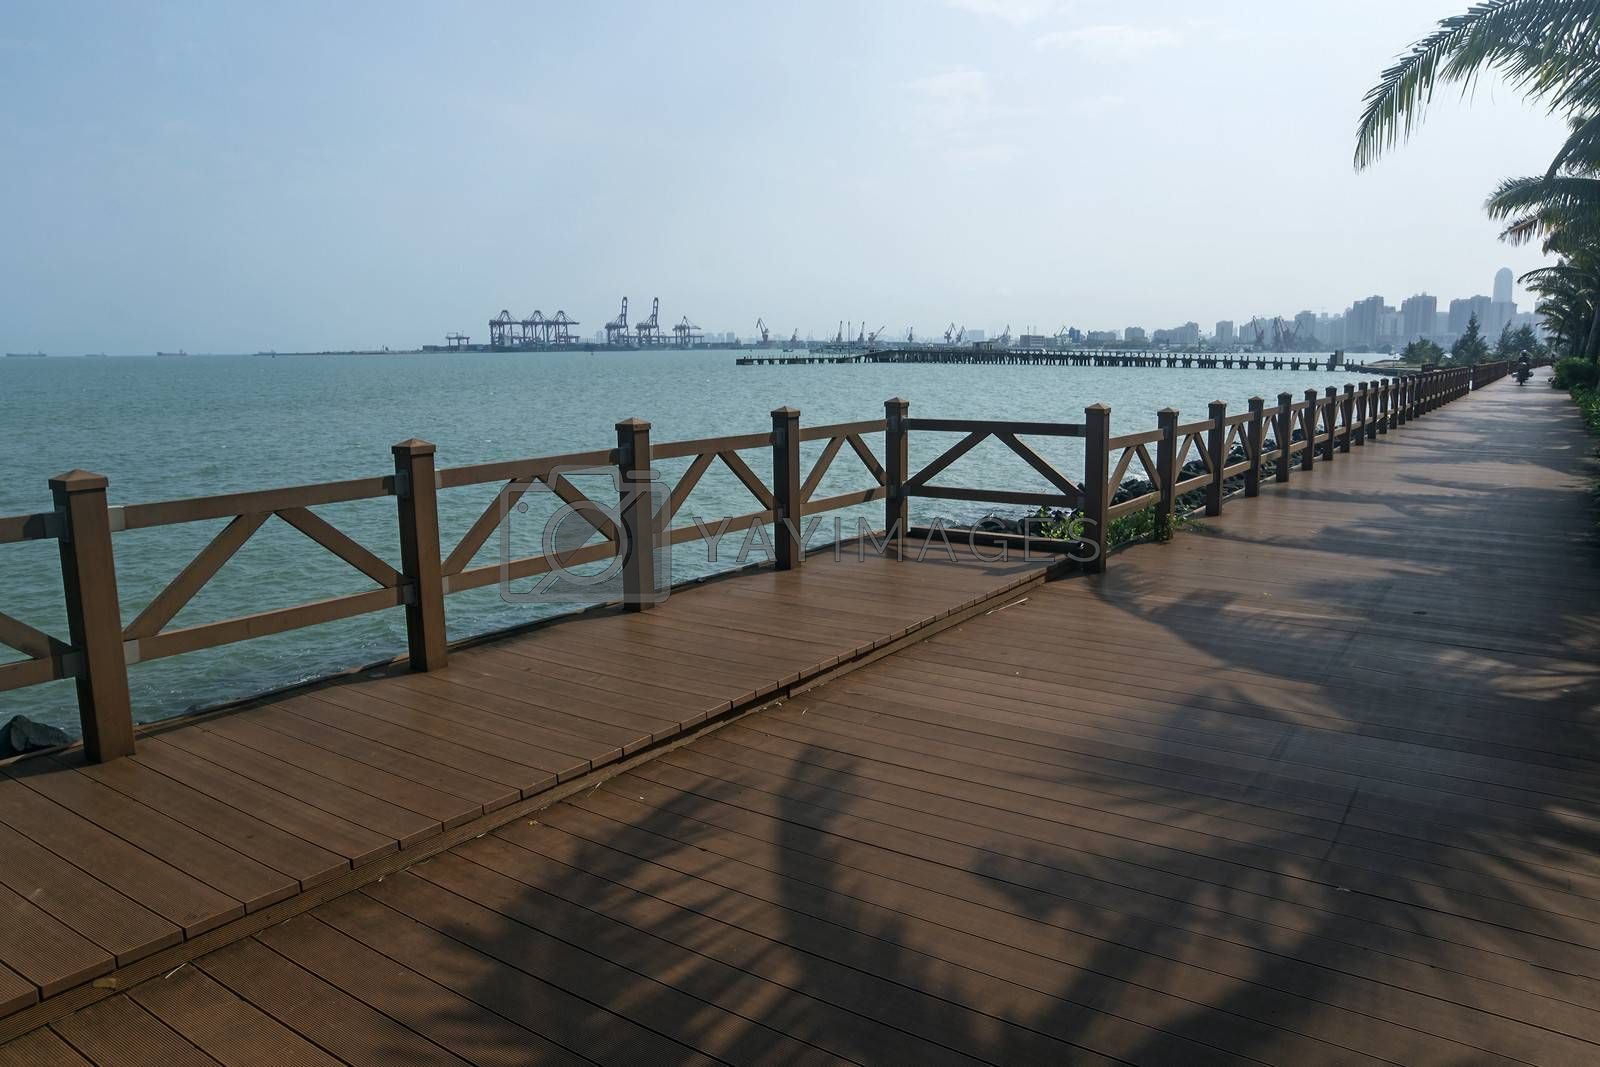 China is trying to make Hainan Island into an international tourist island